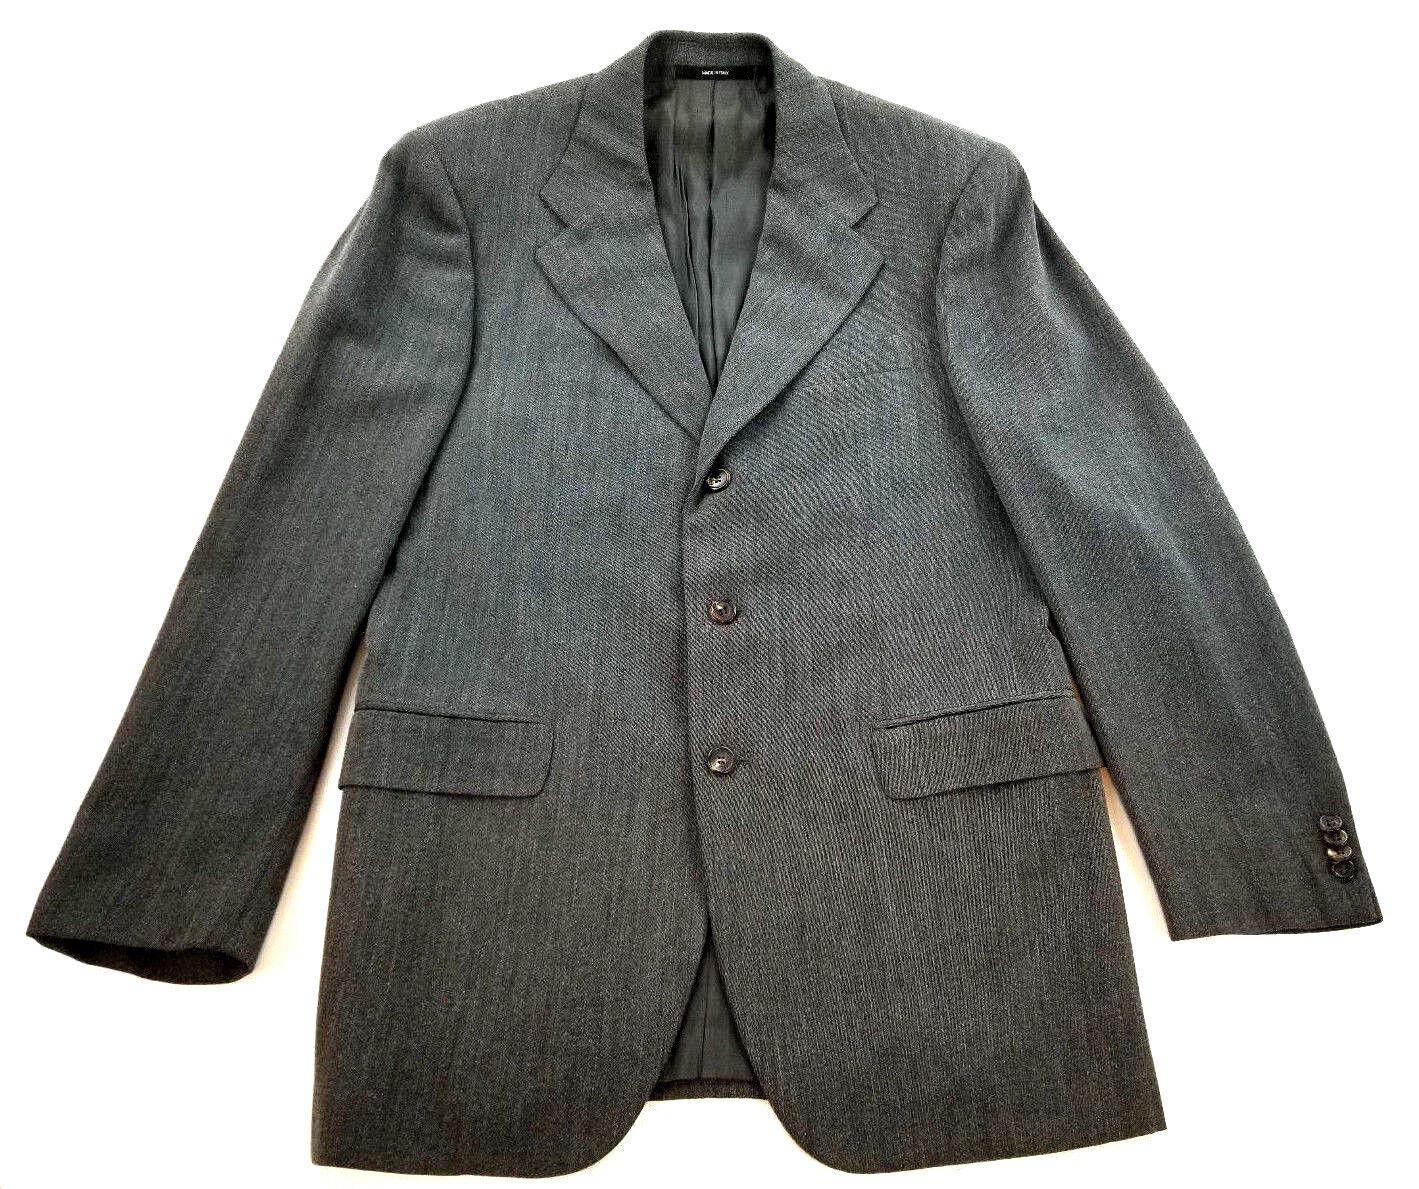 Hugo Boss Baldessarini Herren Anzug 100% Wolle Grau Italien 40L Taille 98 Msrp